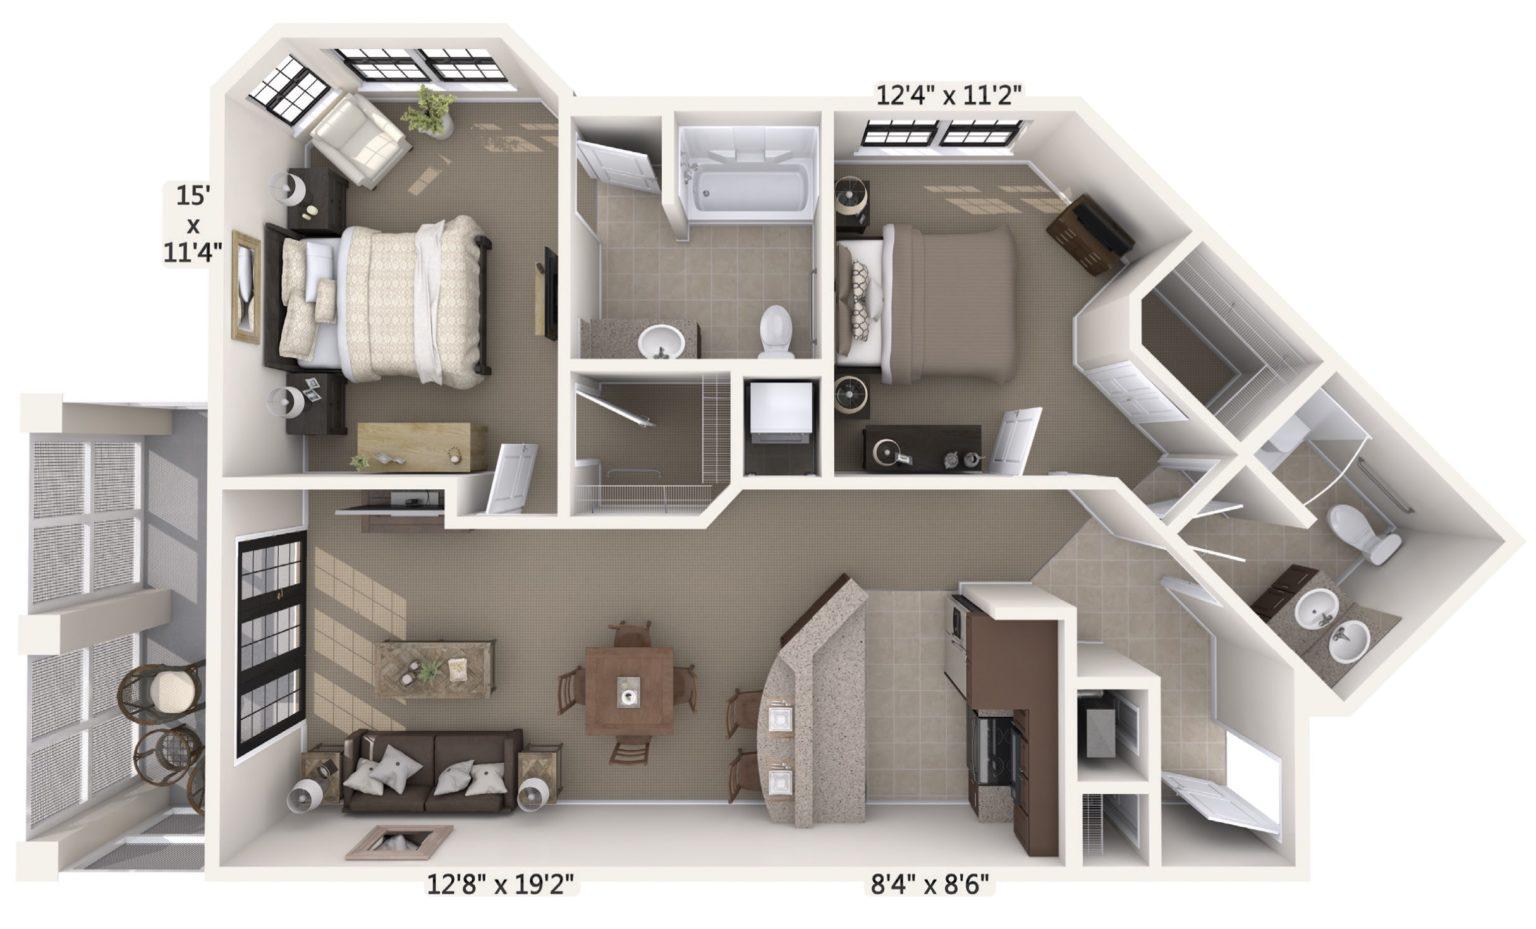 AddingtonPlace_Two-Bedroom-Ensemble_1100-sq.-ft._IL_Jupiter-1536x929